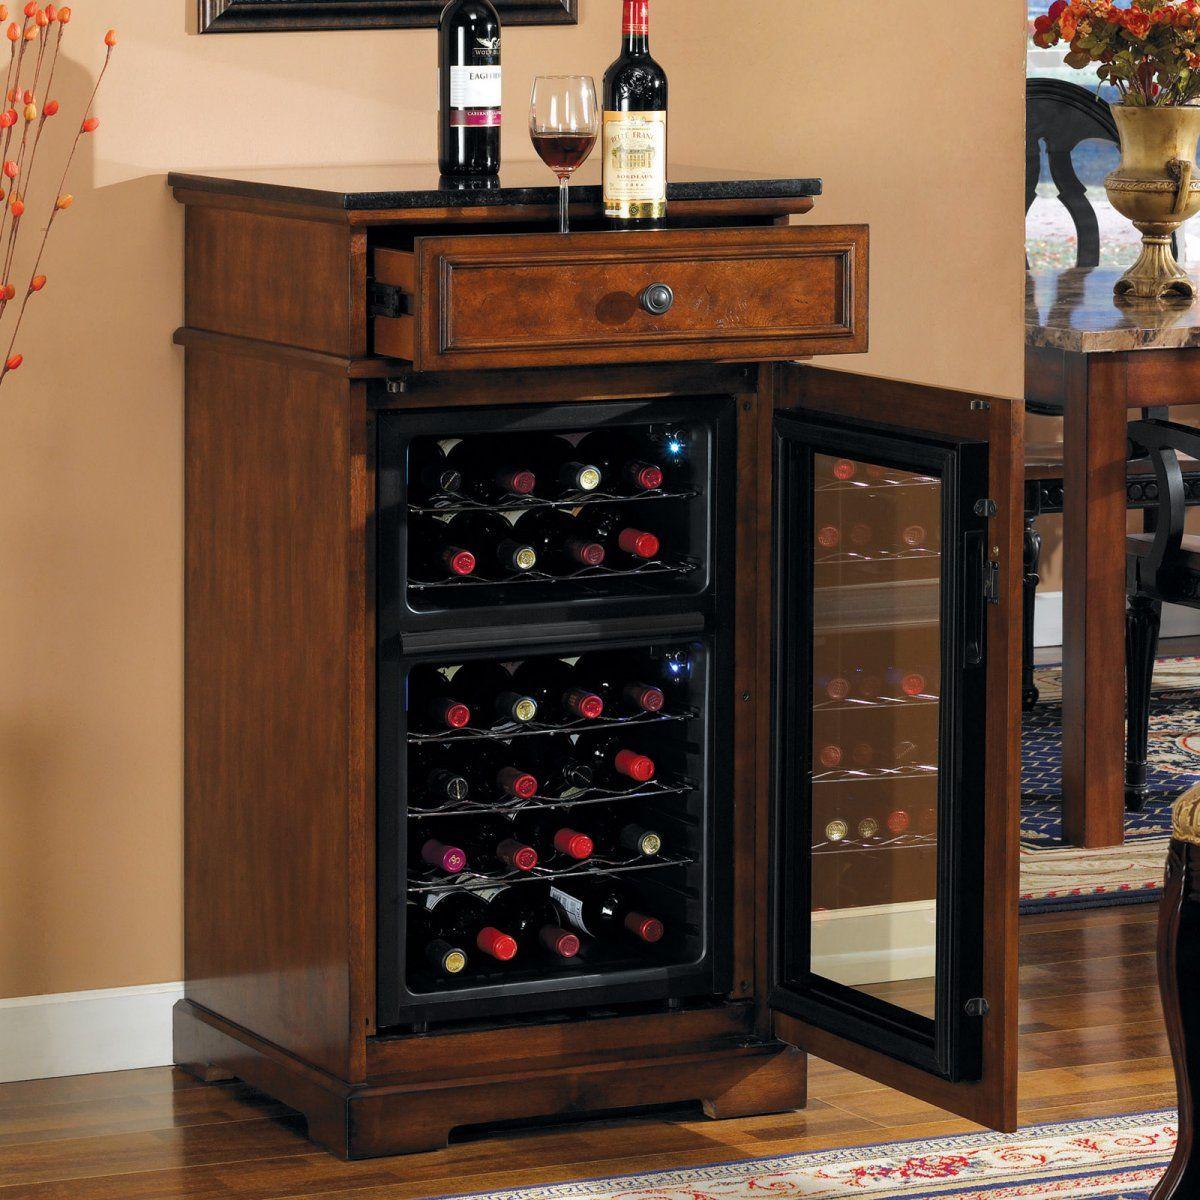 Dual Zone 24 Bottle Wine Cooler